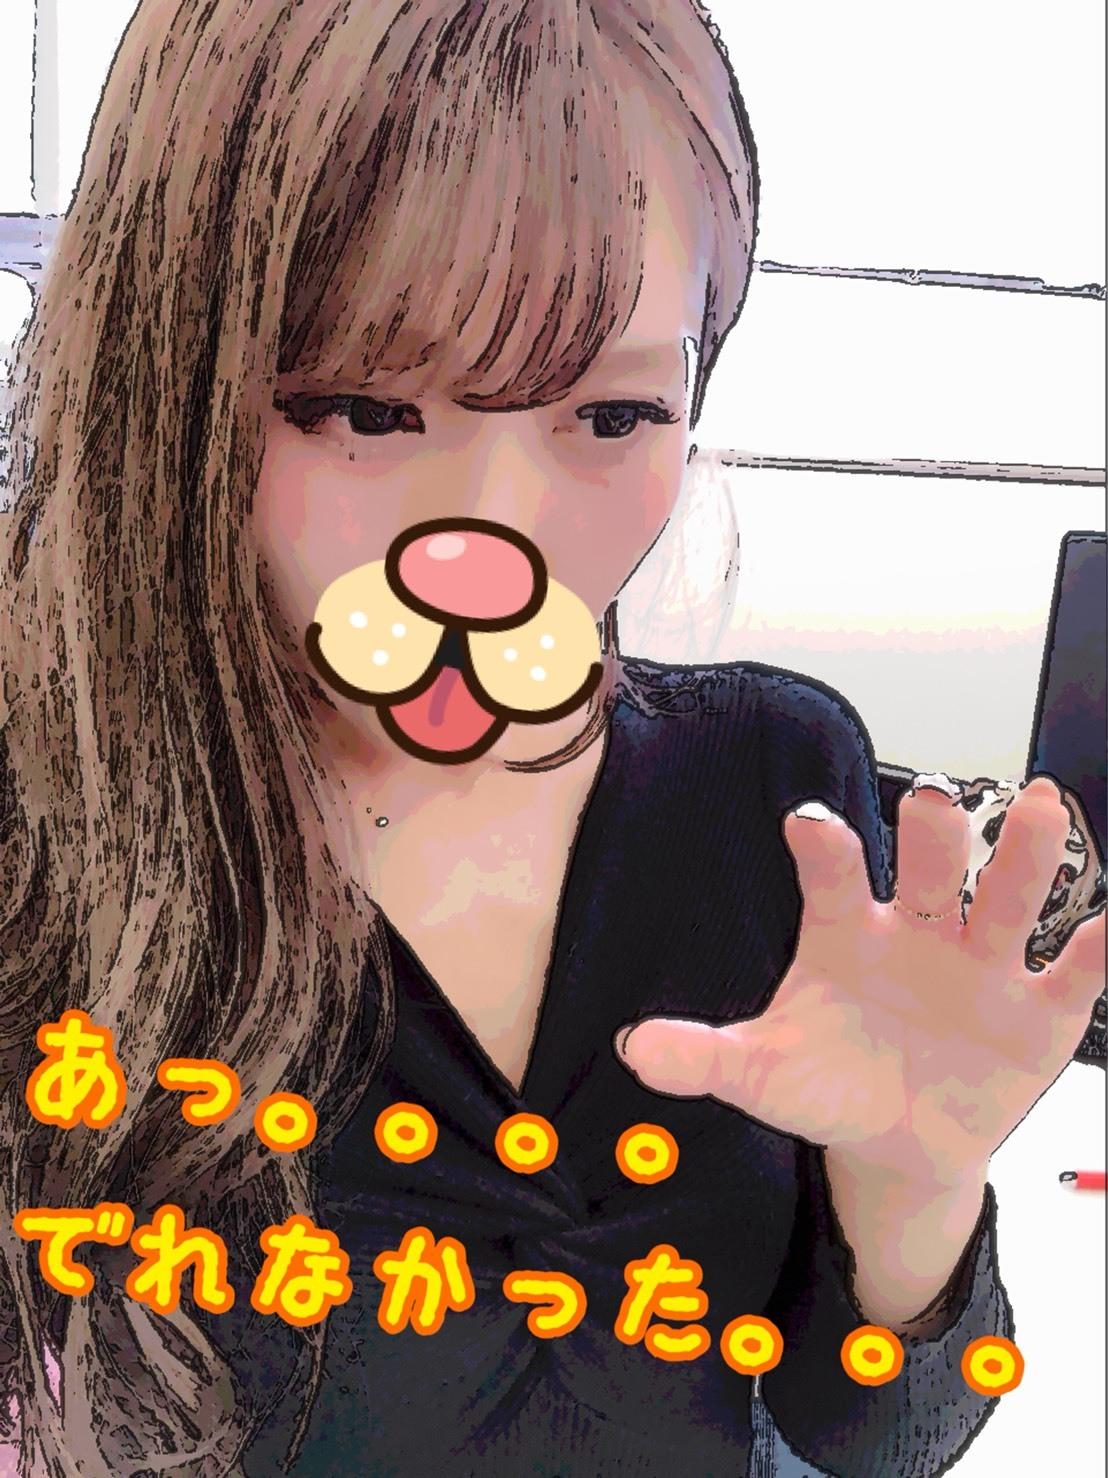 S__14909442.jpg